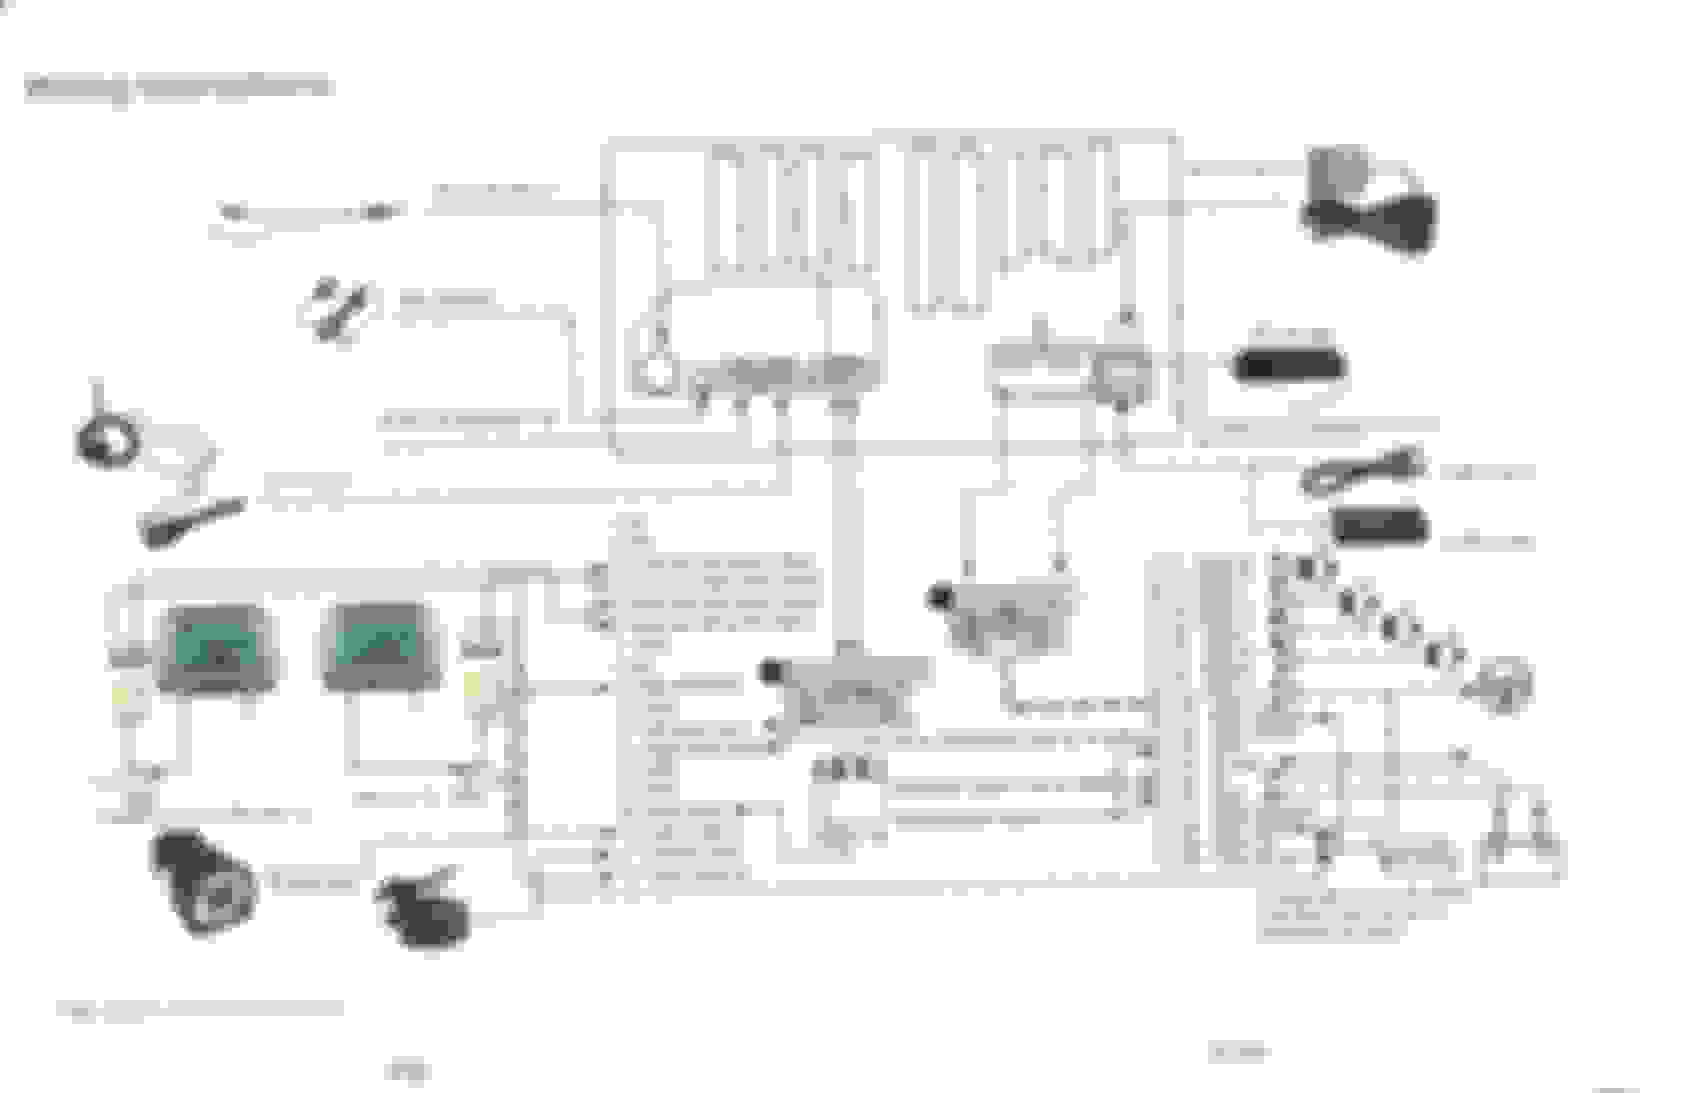 W202 Bosch Alternator Wiring Diagram Electrical Diagrams Oex Mercedes Chie Fuse Box Pump